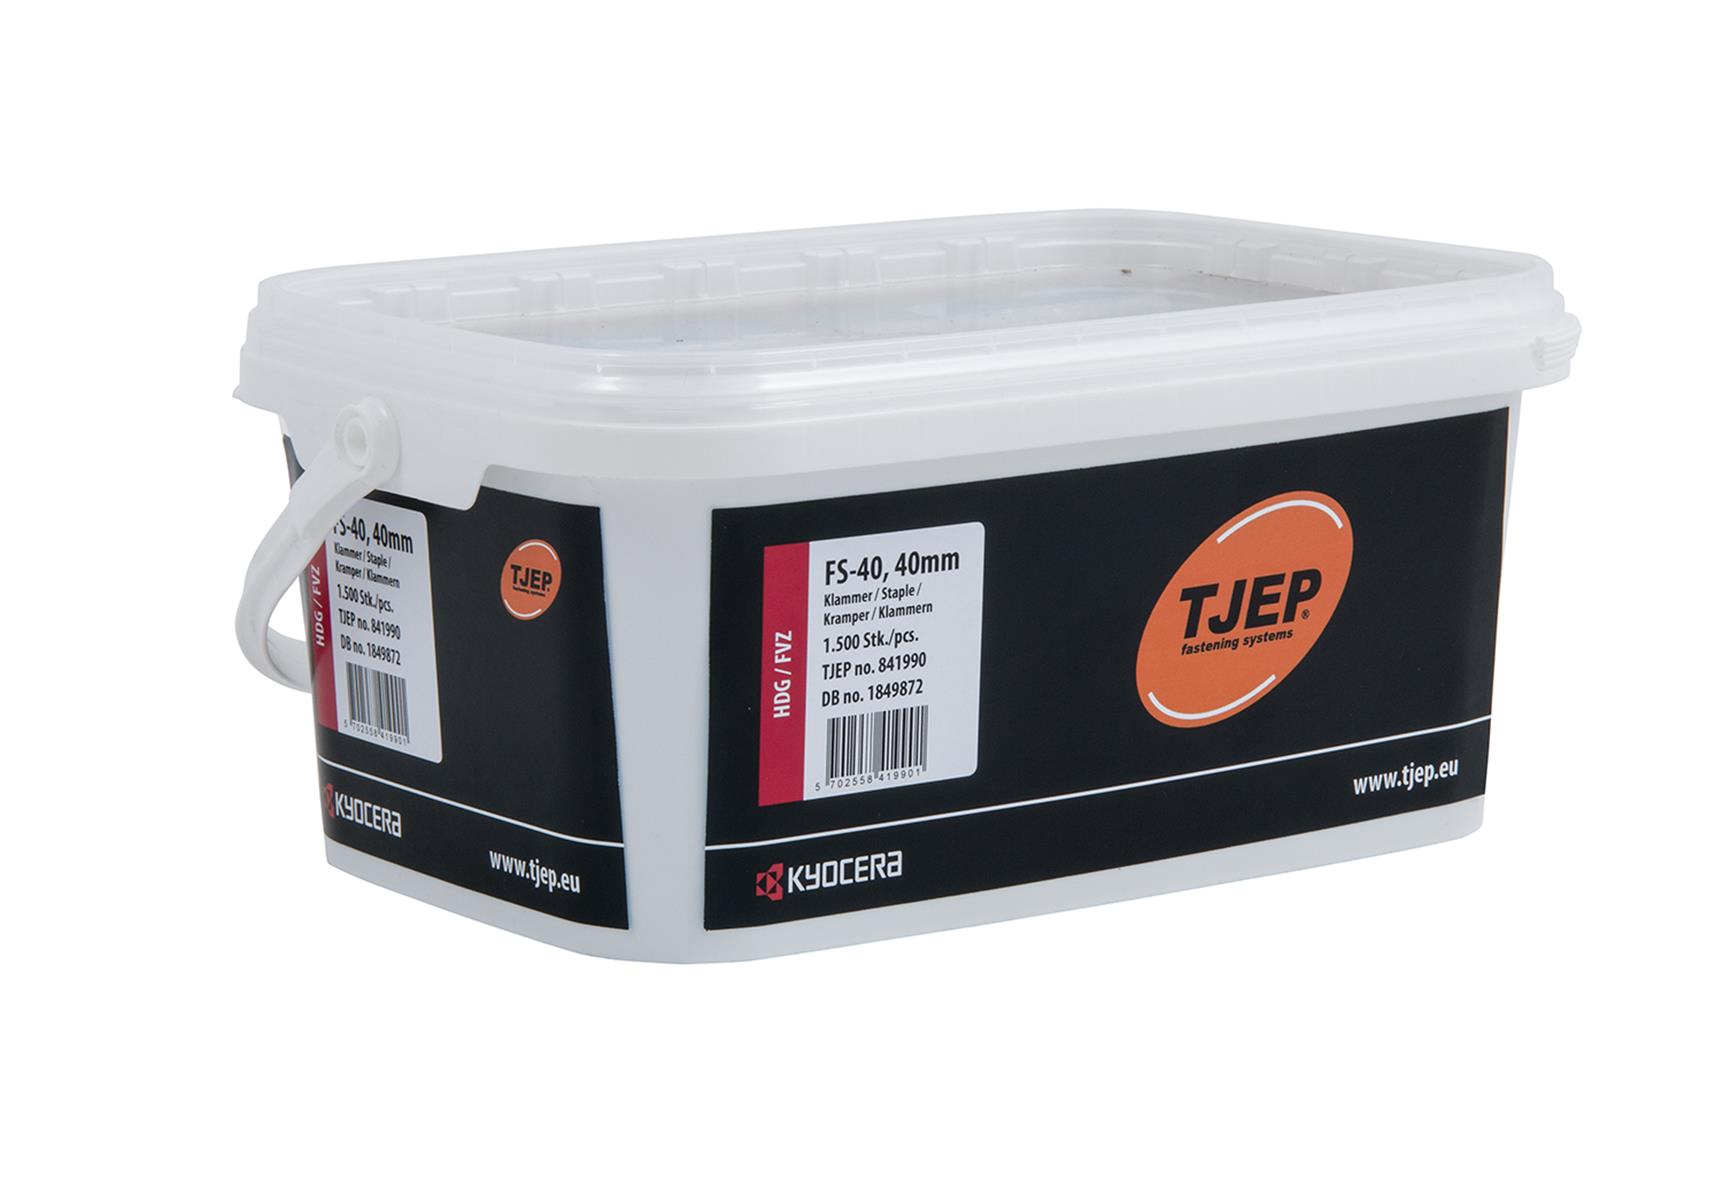 TJEP 841990 Klammer FS-40 FZV 1500-pack 315 x 40 mm